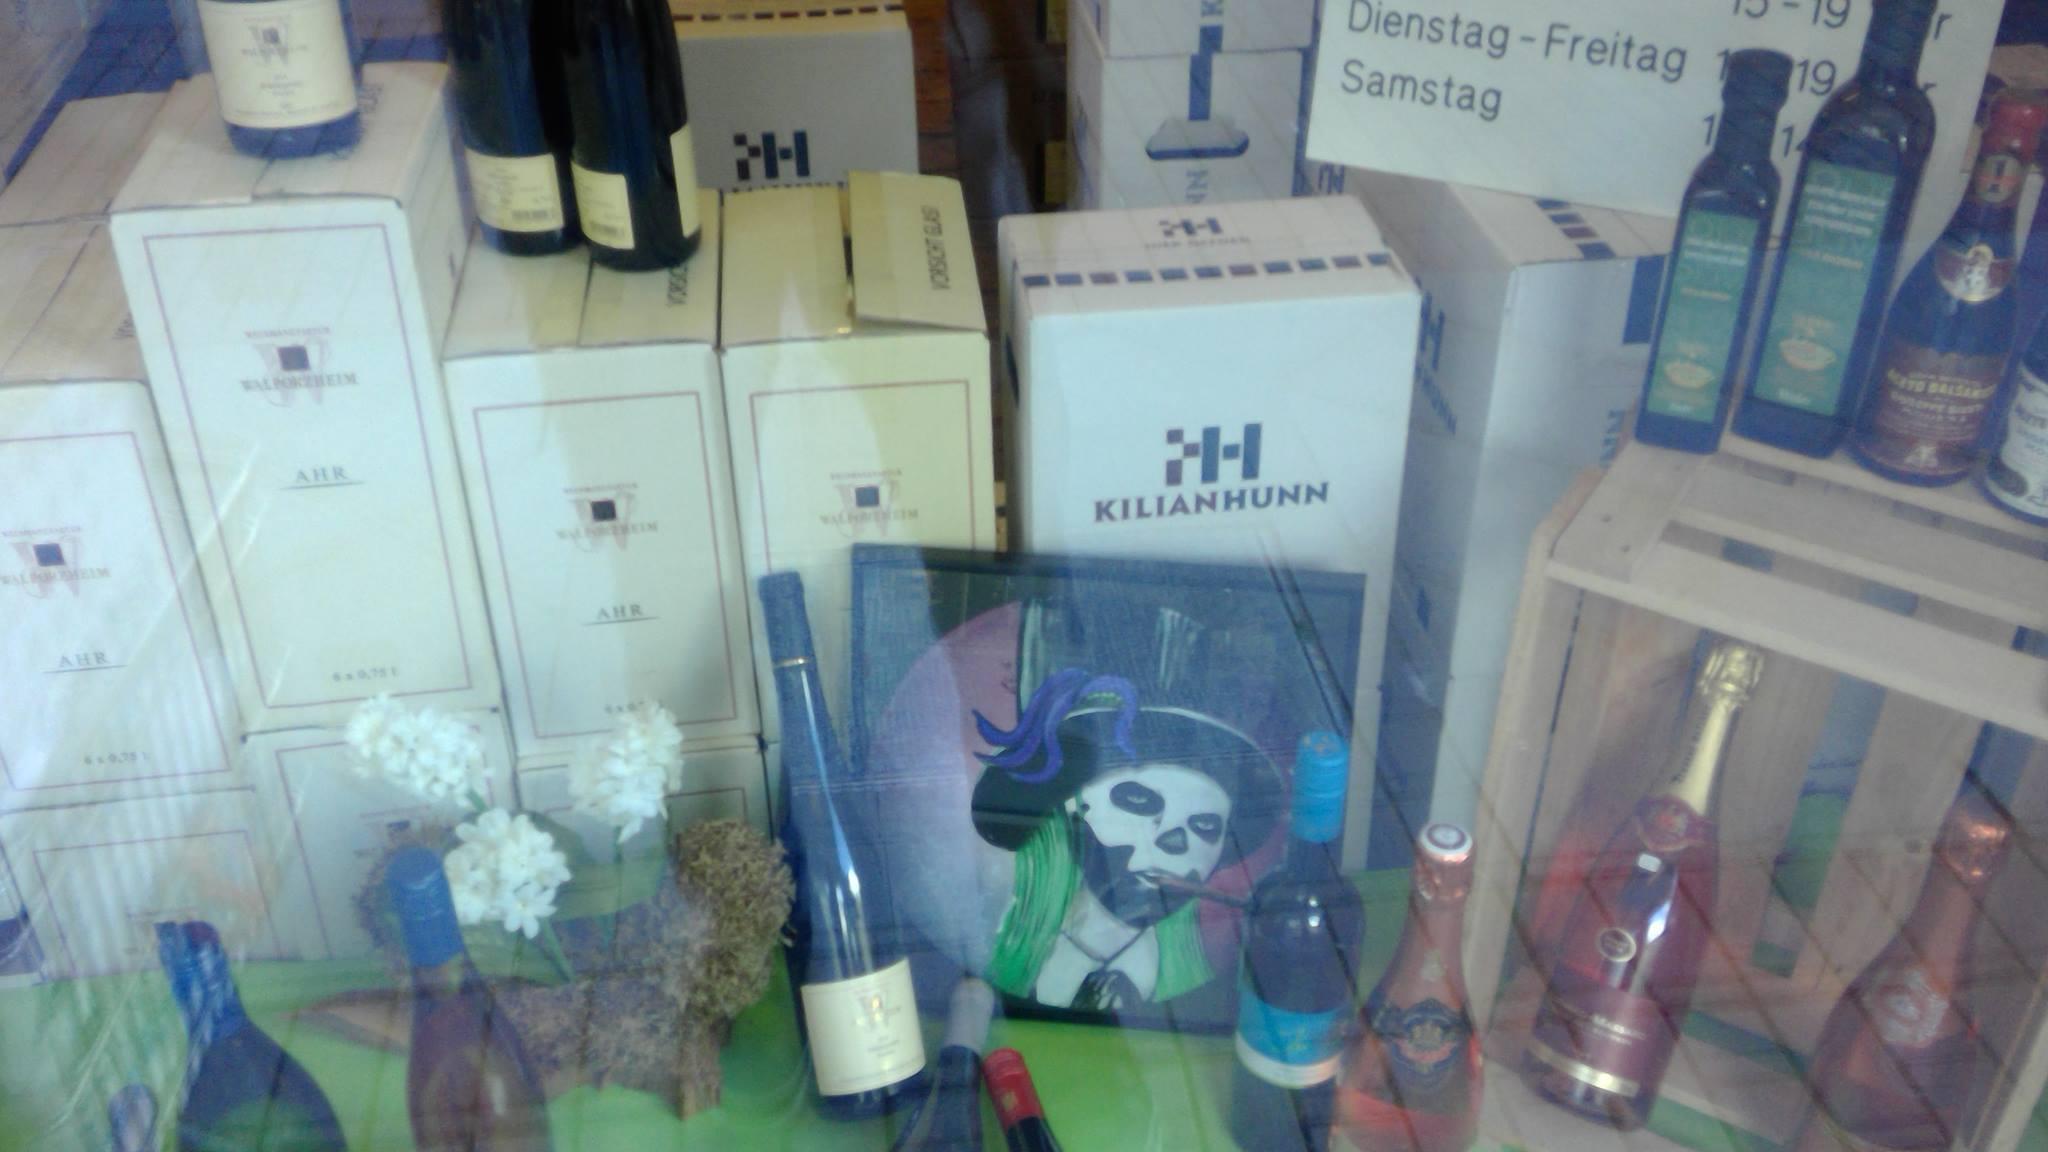 Lindener Weinladen 2016